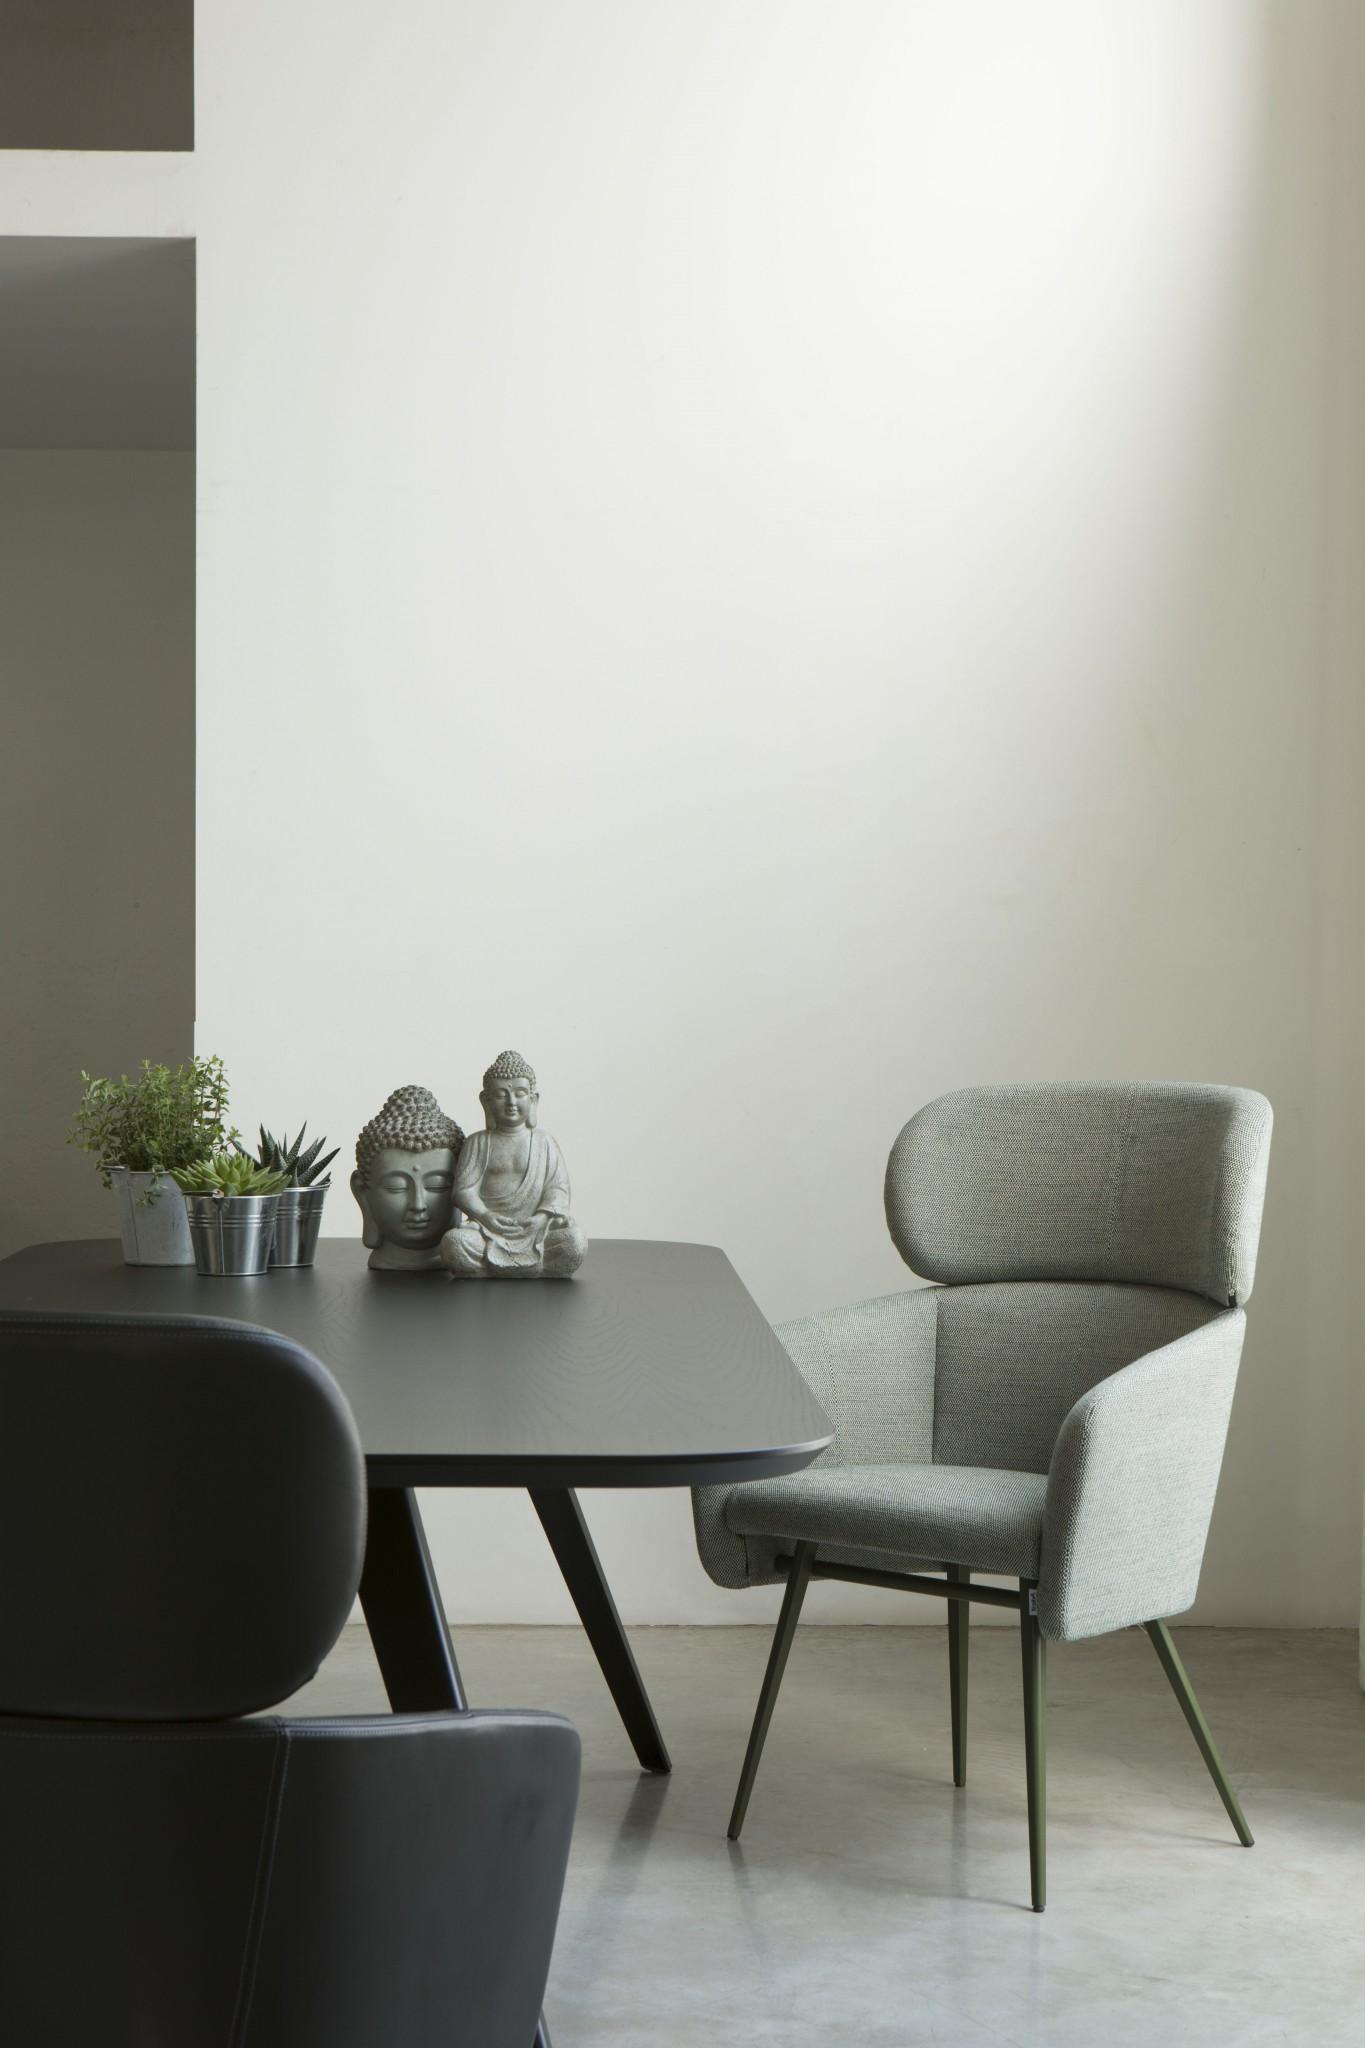 BALU' XLMET+AKY TABLE